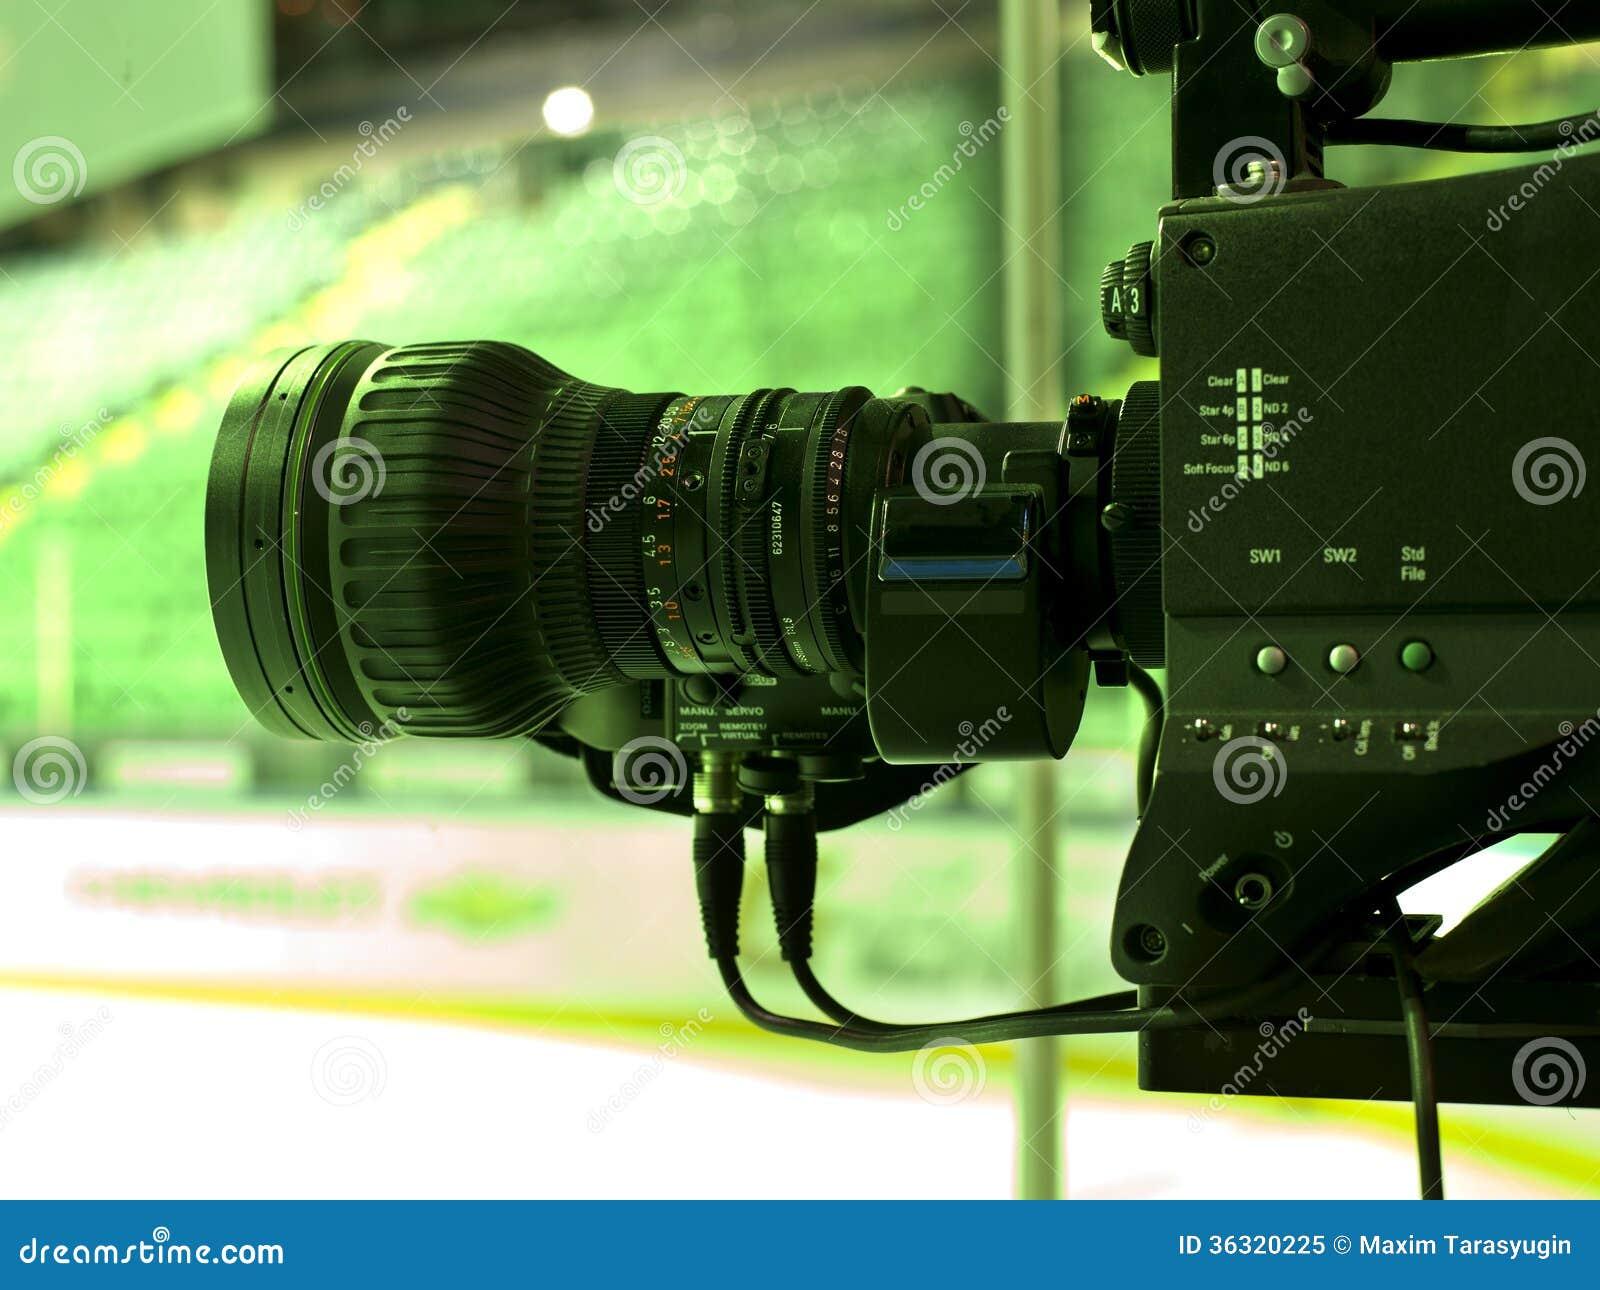 Professional Digital Video Camera Royalty Free Stock Photo ...